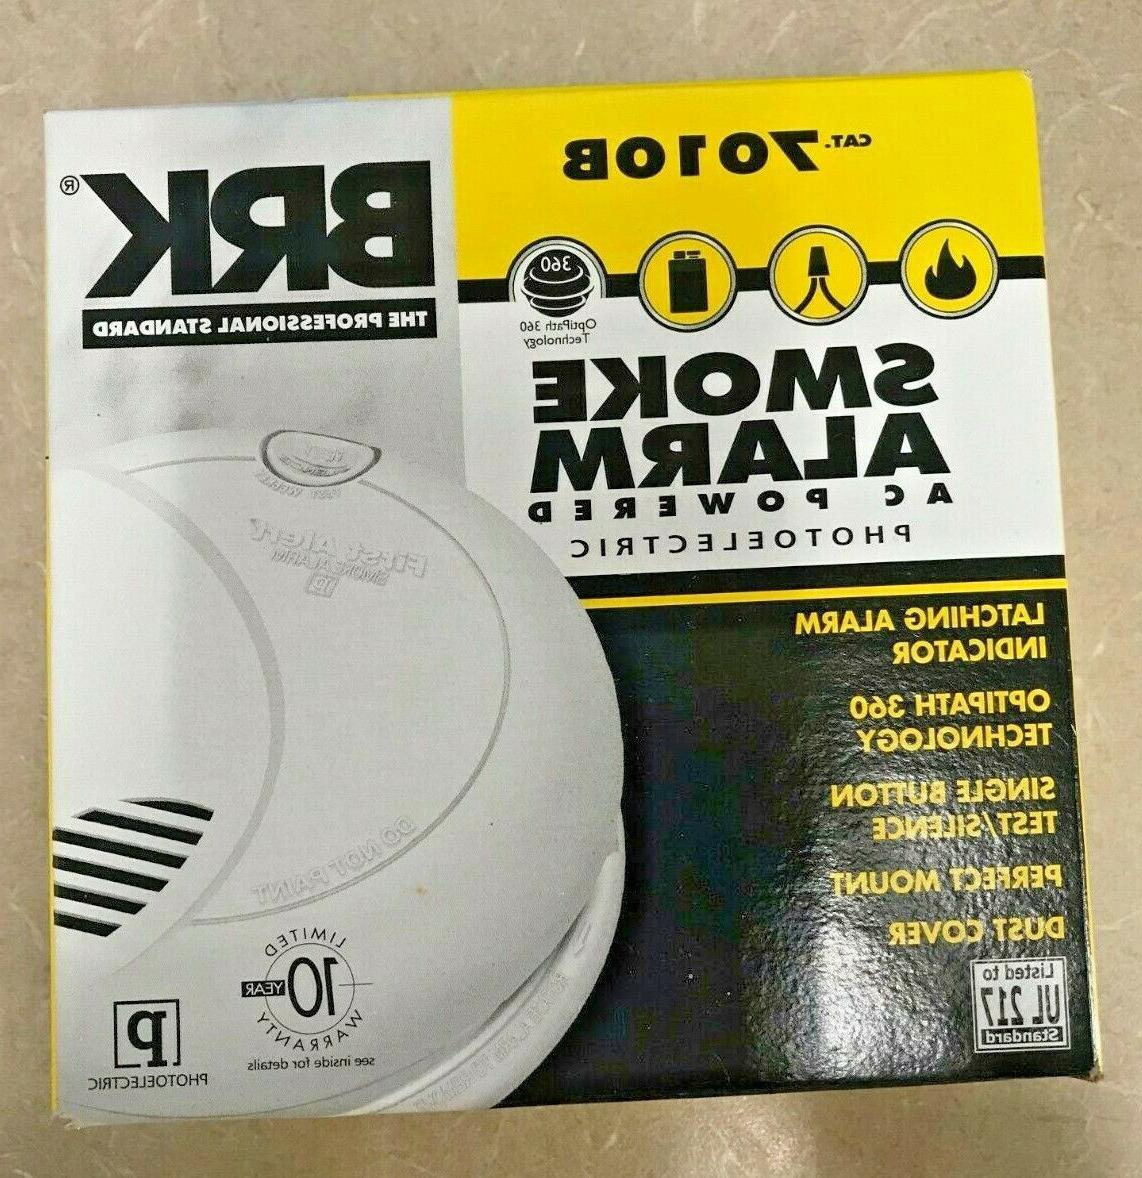 7010b photo electronic smoke alarm